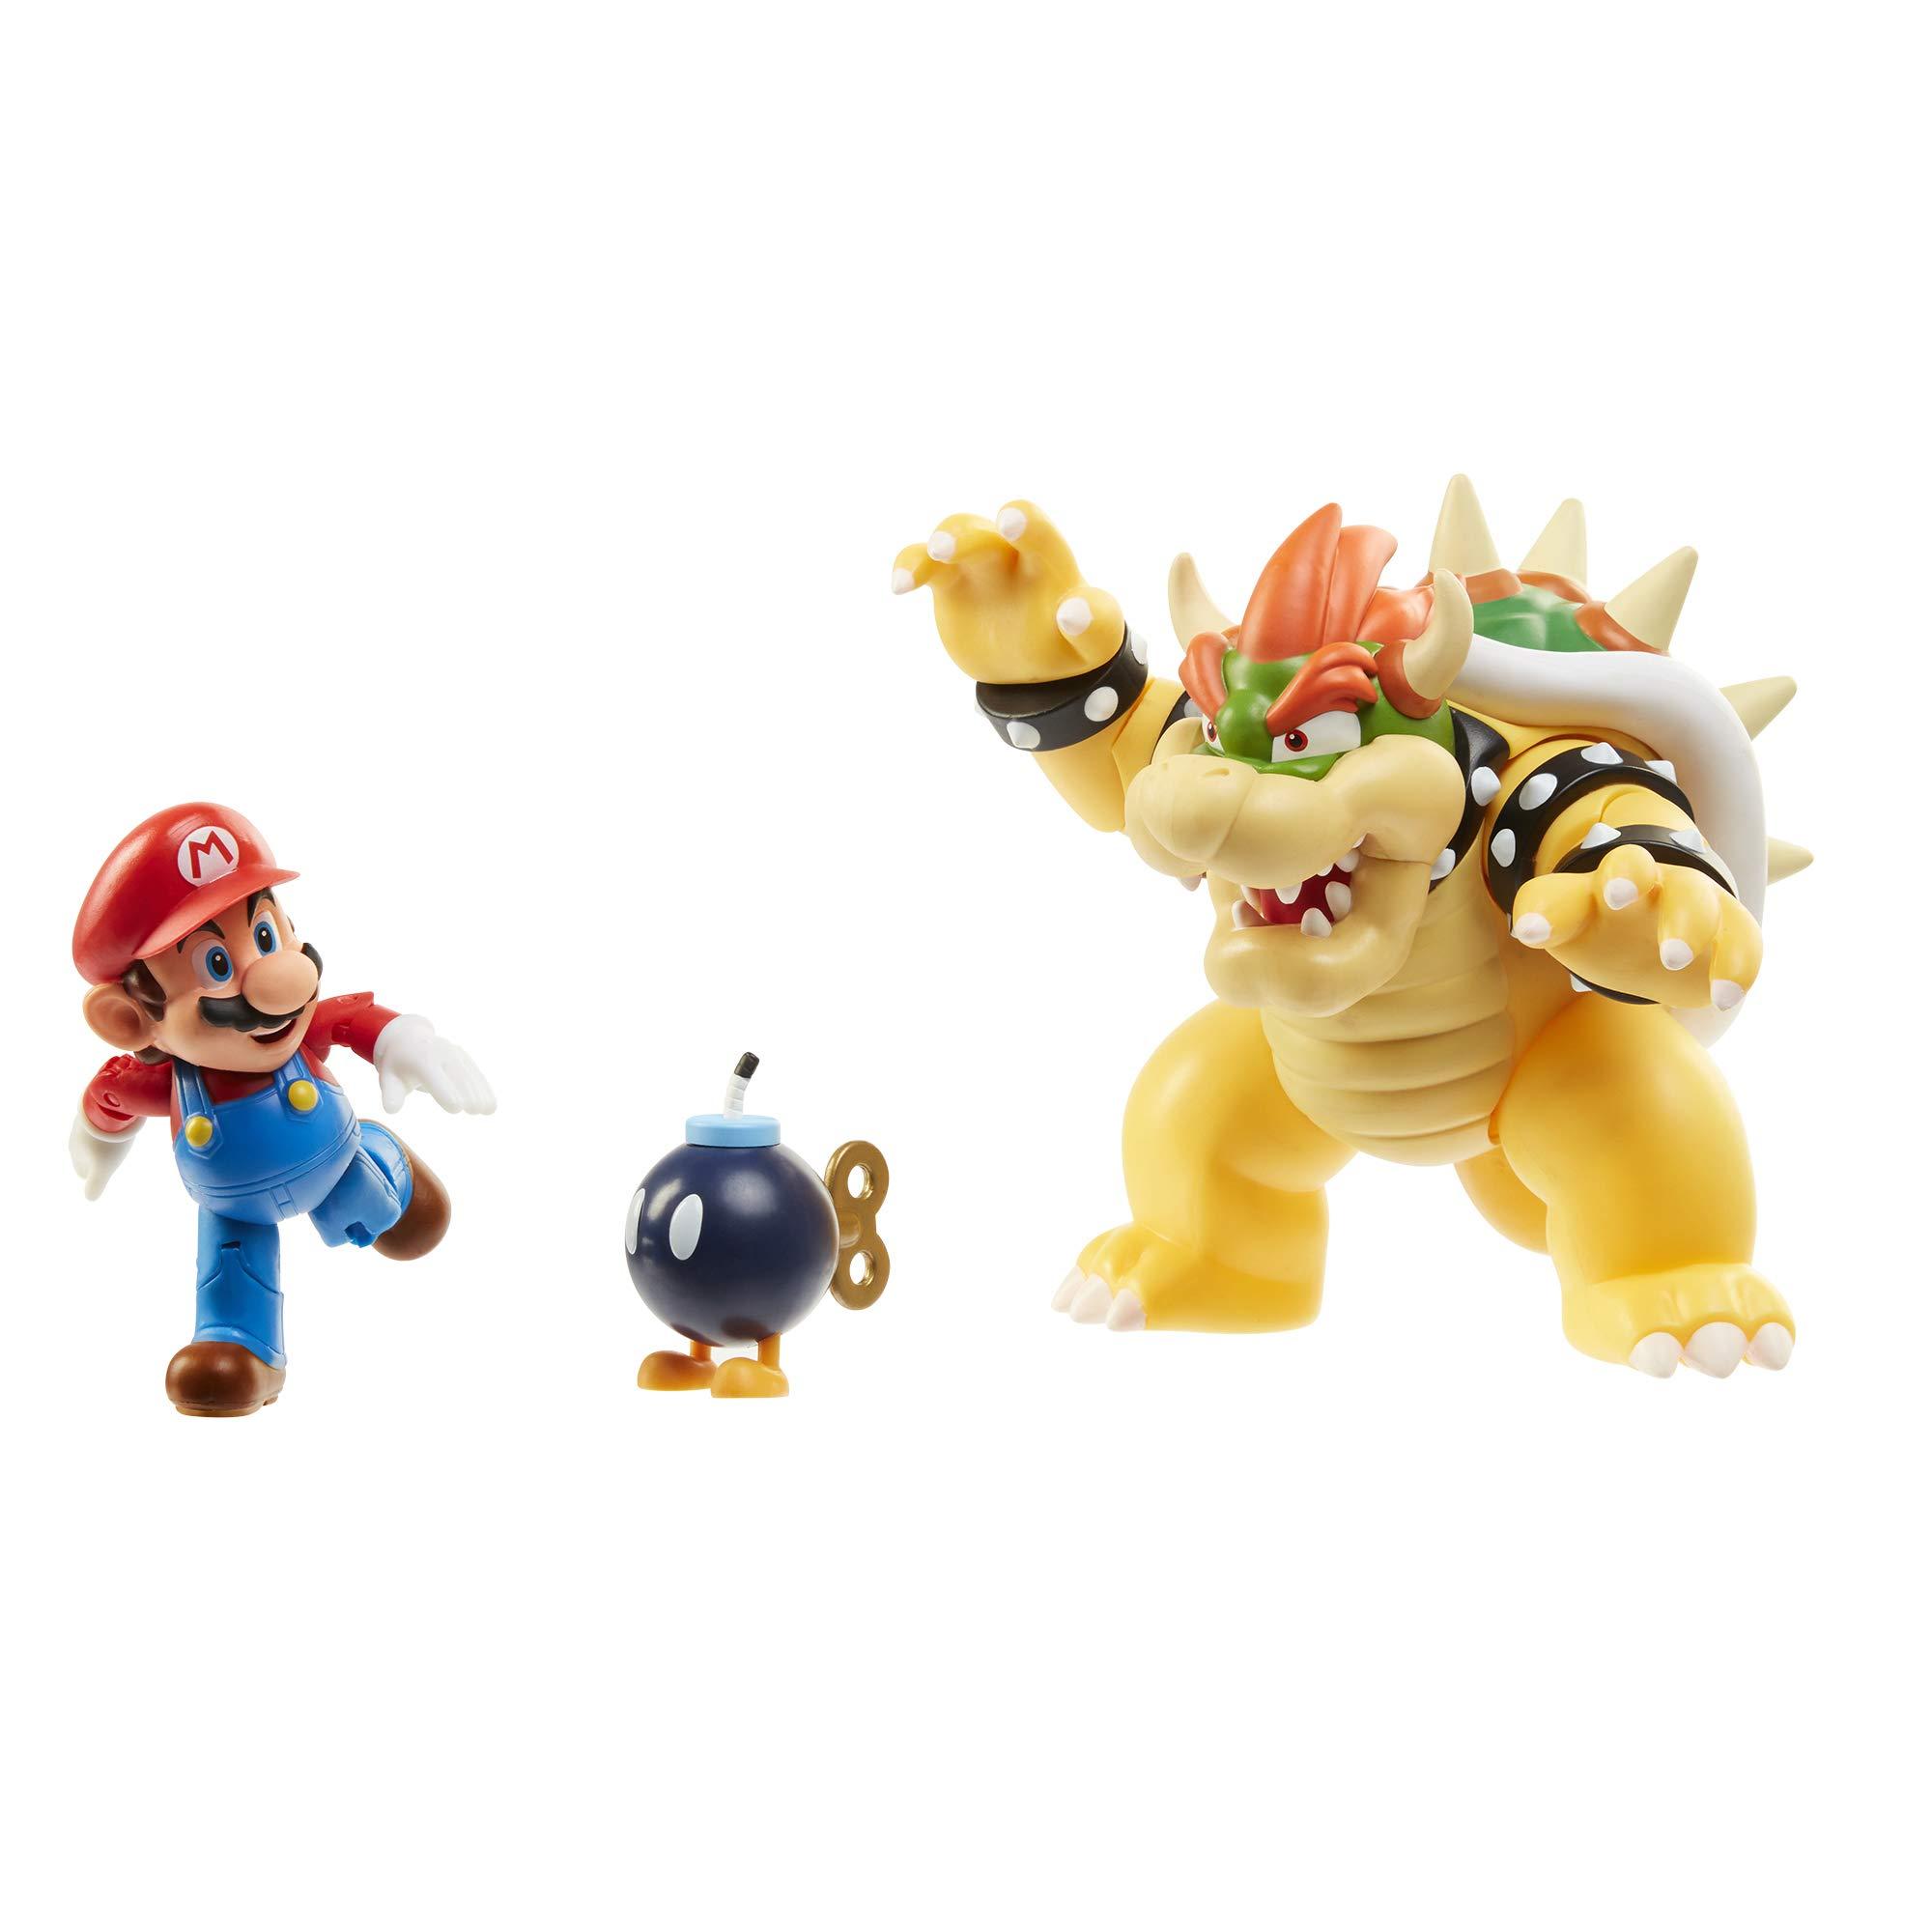 Nintendo Super Mario Bowser Vs Mario Diorama Figure 3 Pack by Nintendo (Image #3)